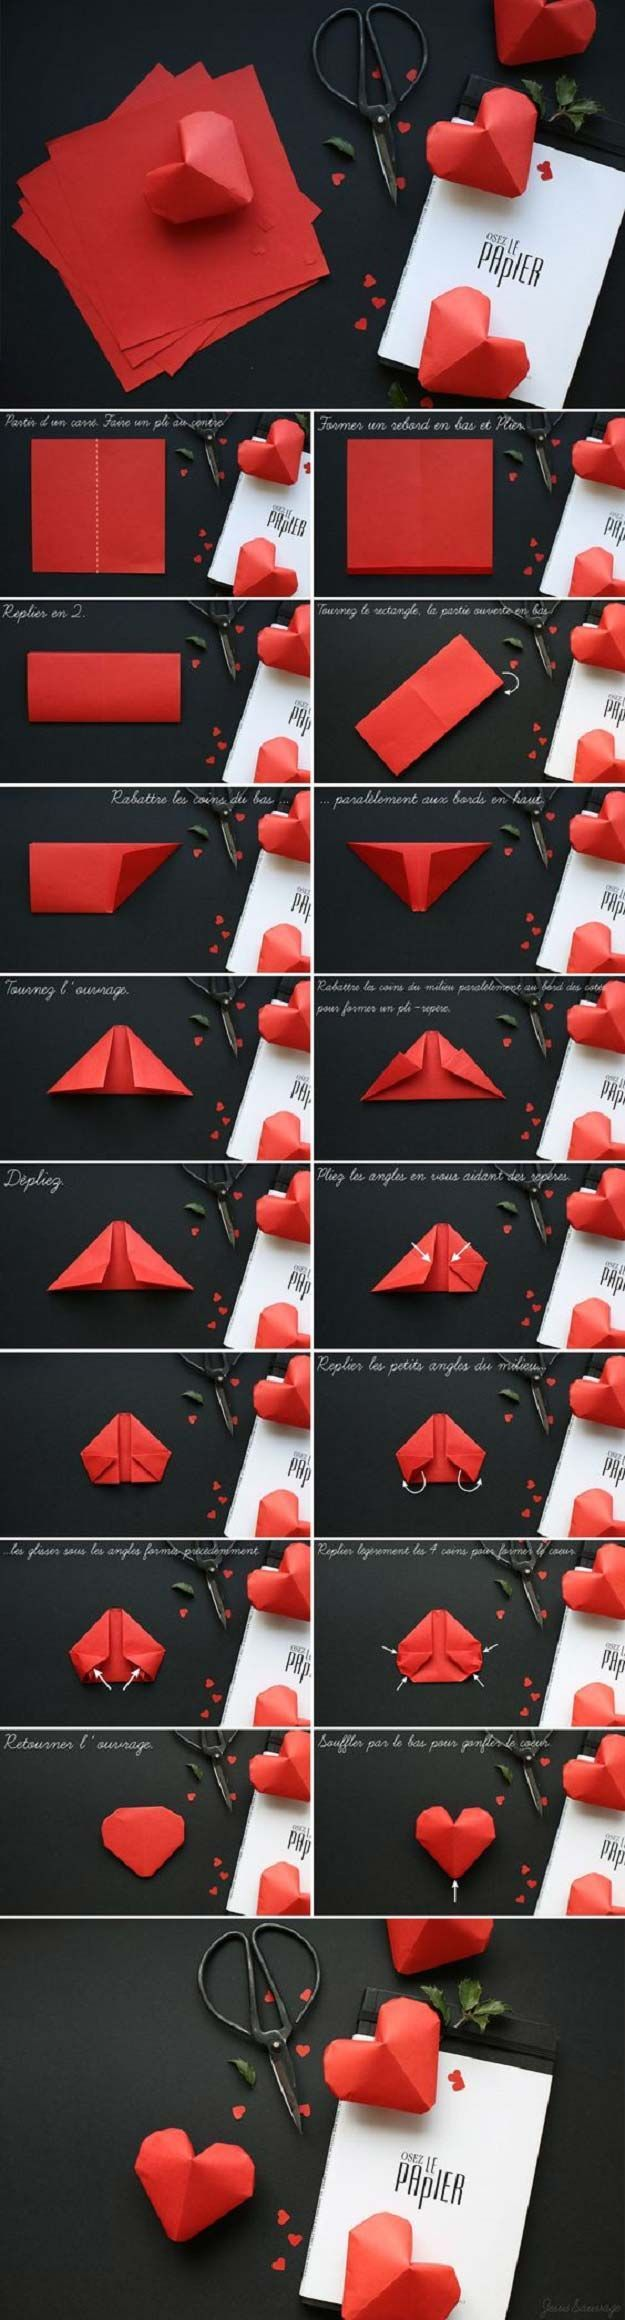 Origami Hearts | 2320x625